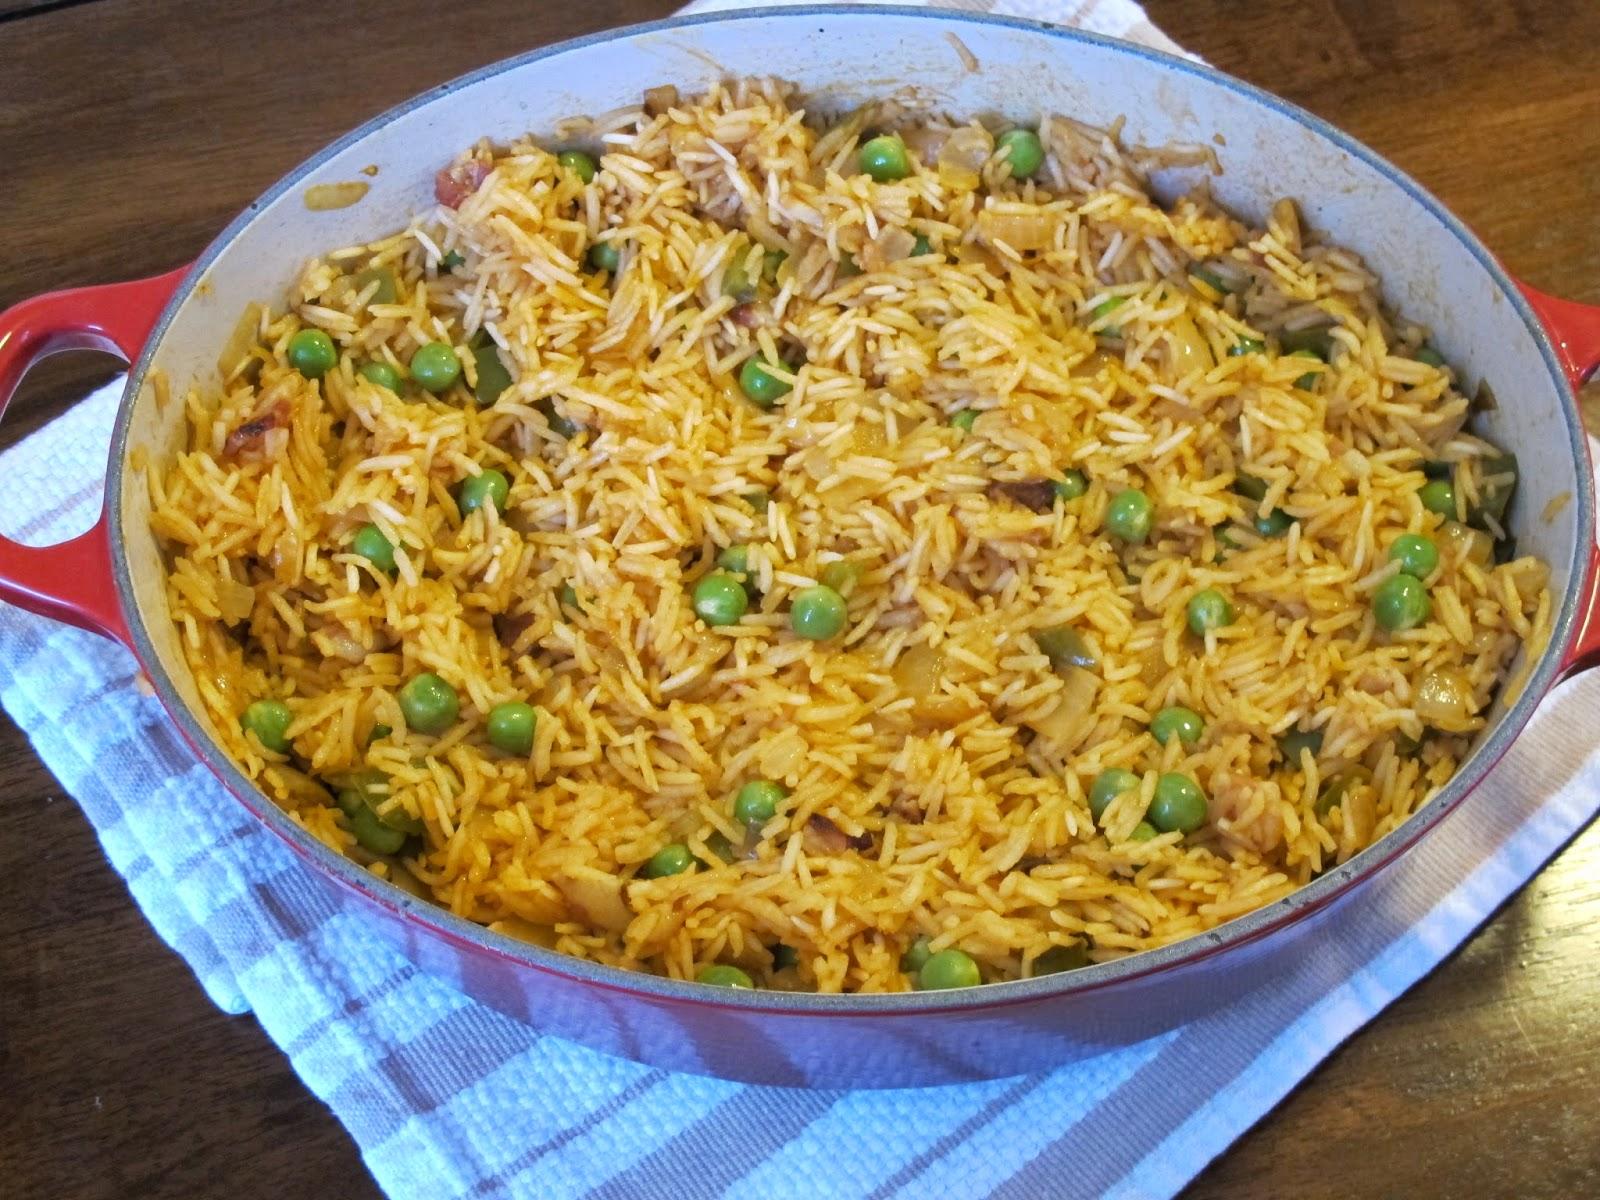 Bahamian Peas and Rice